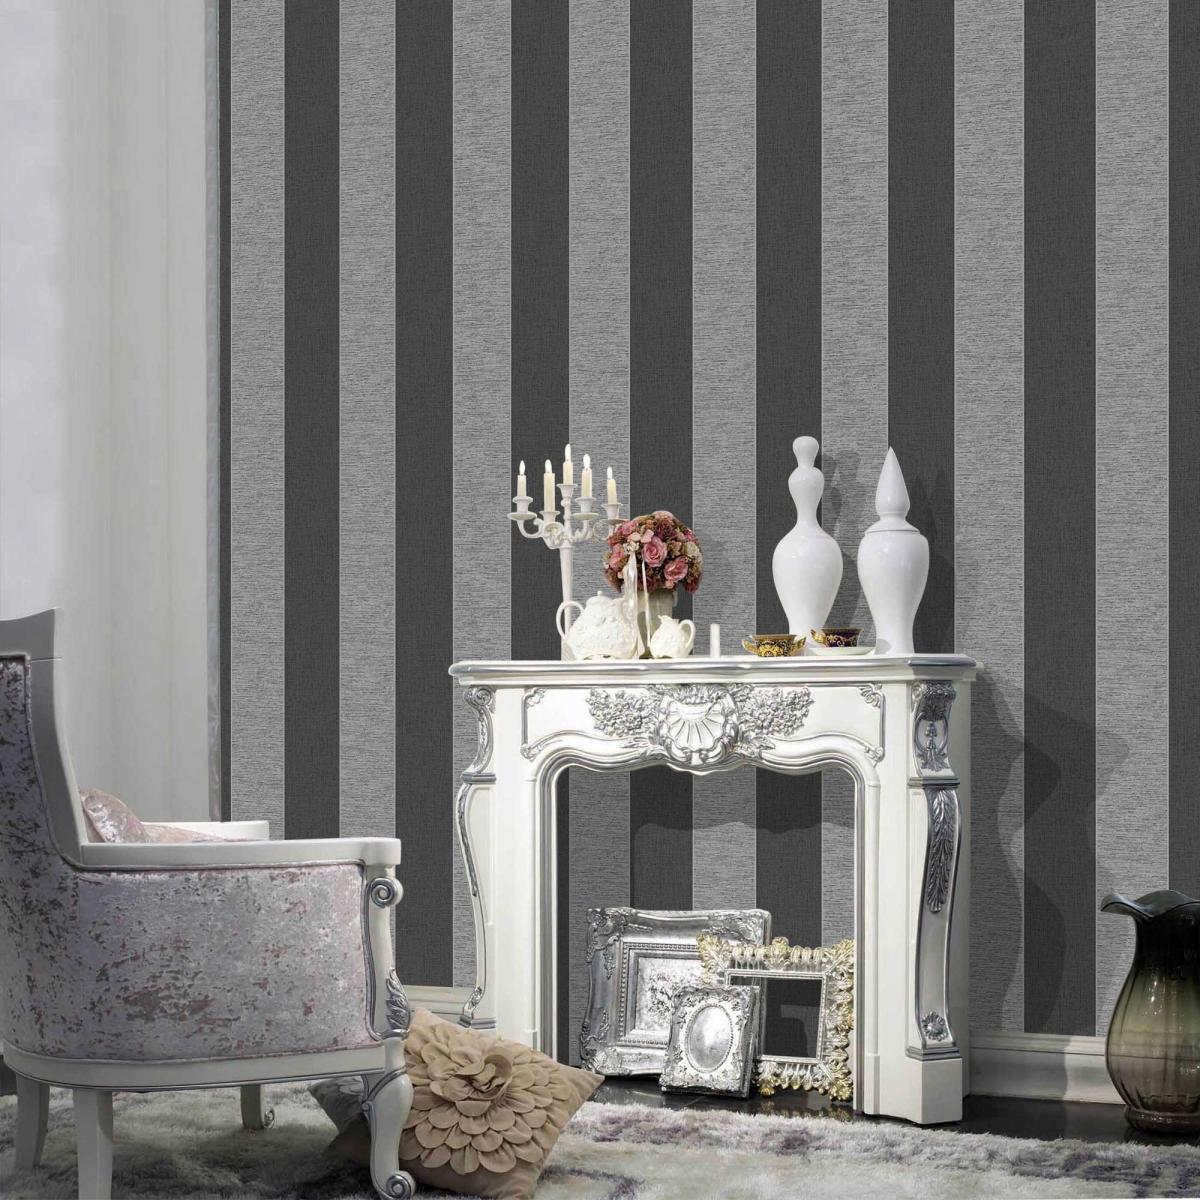 Shop By Brand Fine Decor Torino Black and Grey Stripe Wallpaper 1200x1200